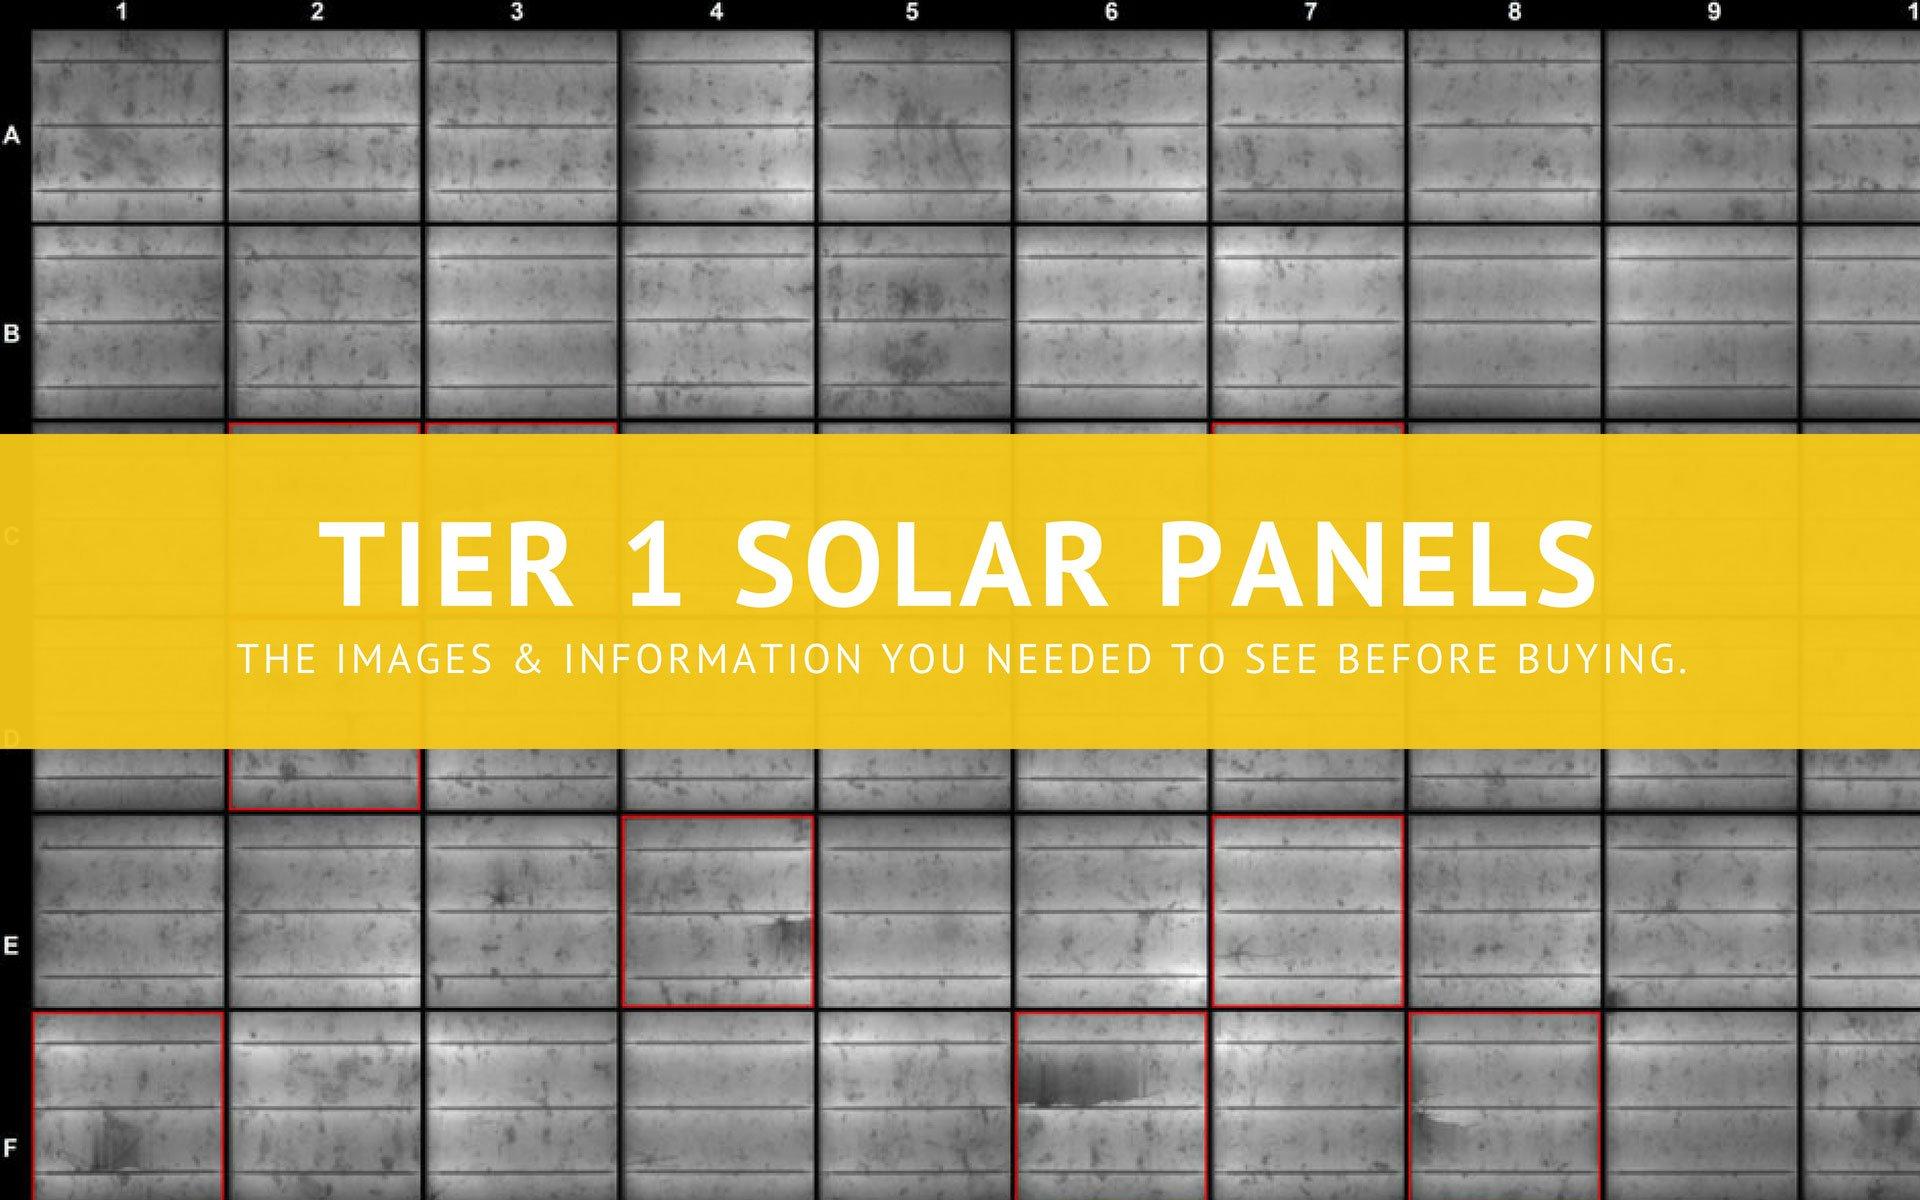 Latest Tier 1 Solar Panels List 2018 8 Points Of Critical